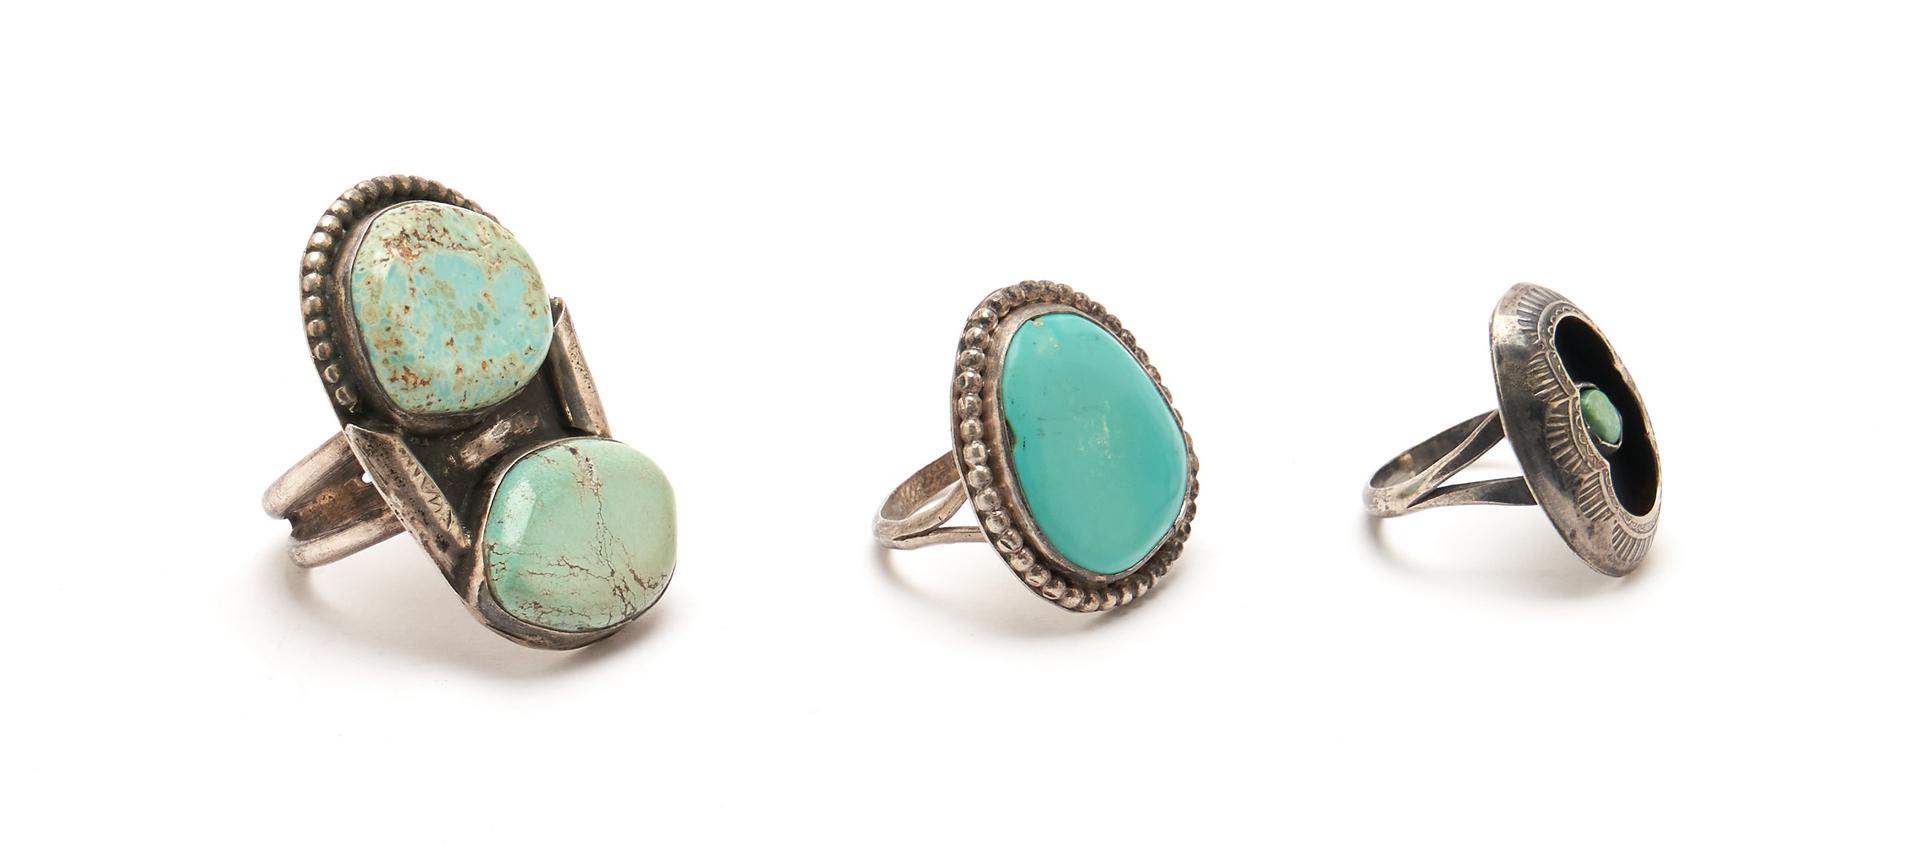 Lot 1088: 5 Navajo Turquoise & Silver Jewelry Items, incl. Etsitty & Benally